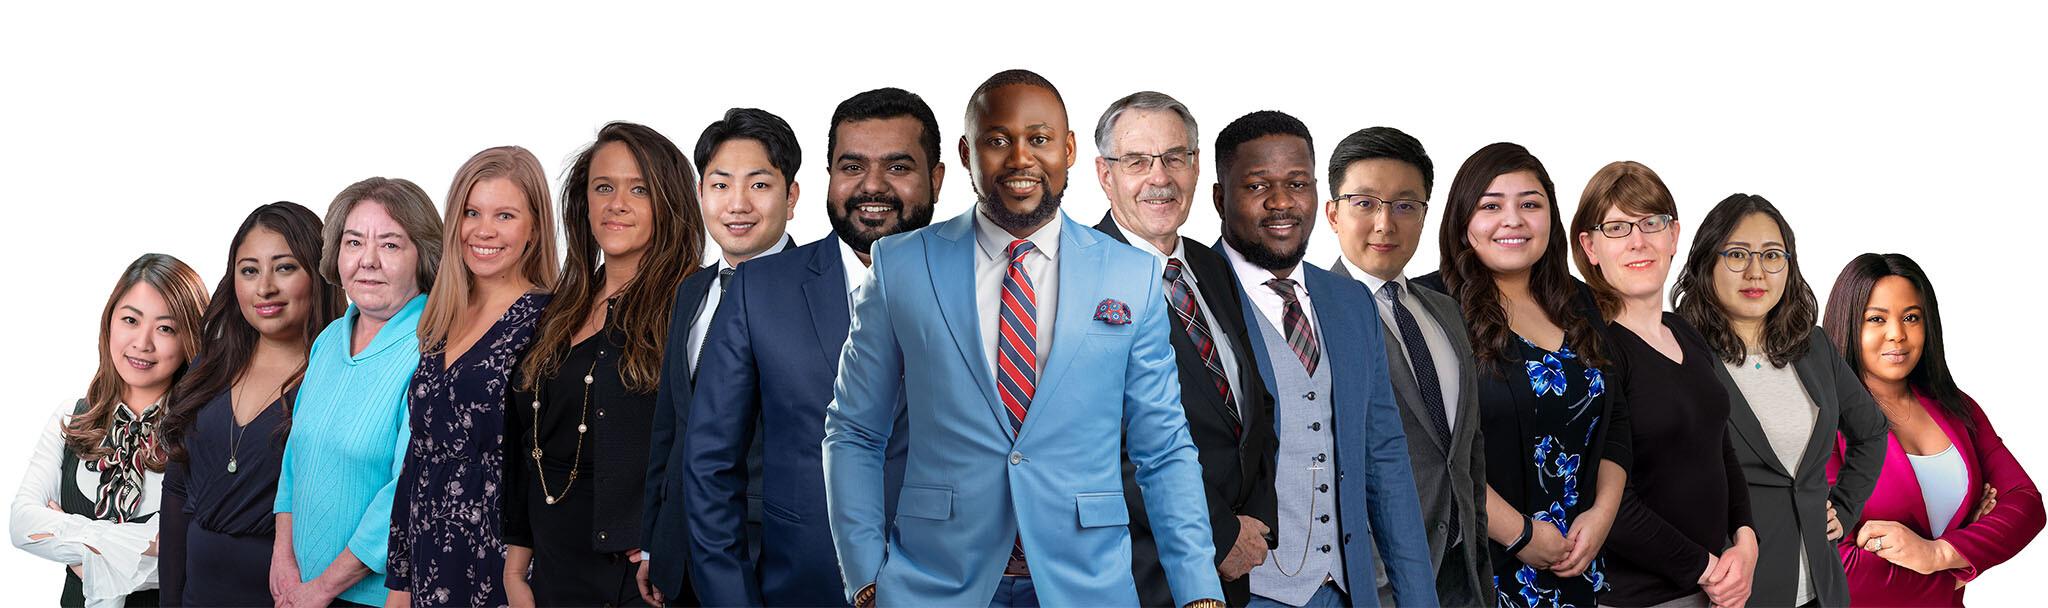 calgary_lawyers_team_2021_osuji_and_smith_lawyers